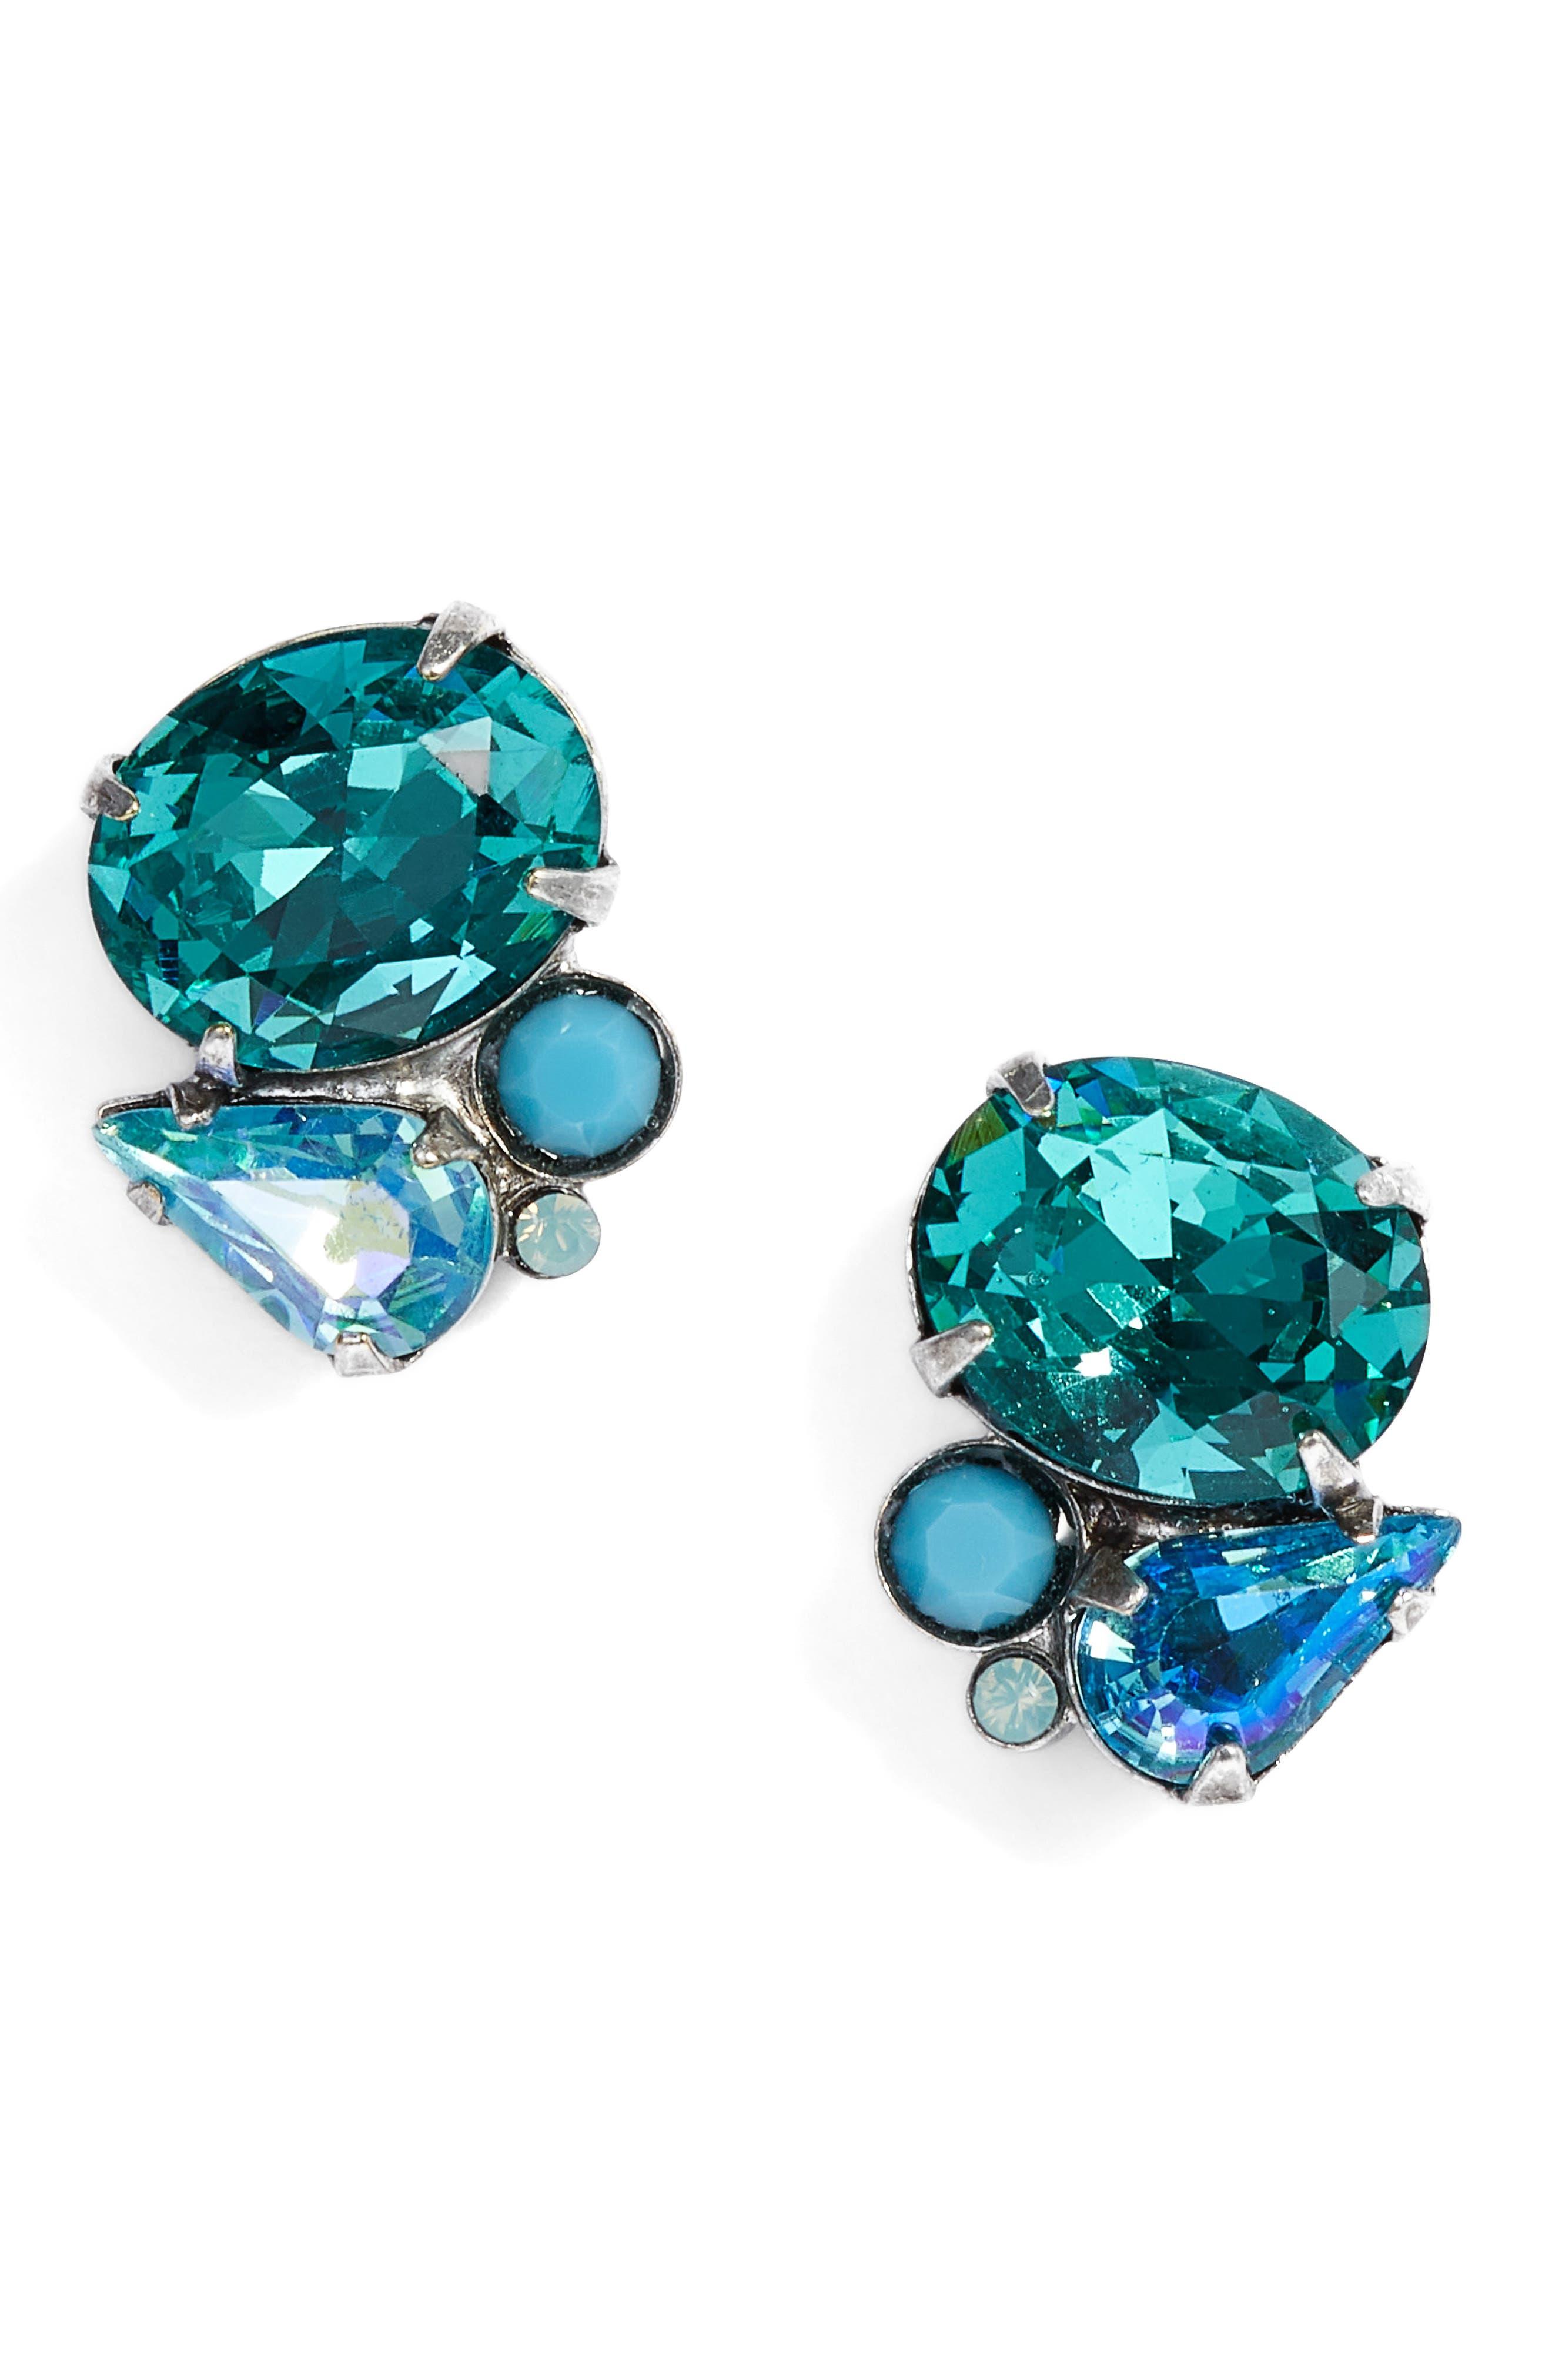 Mayflower Crystal Earrings,                         Main,                         color, Blue-Green